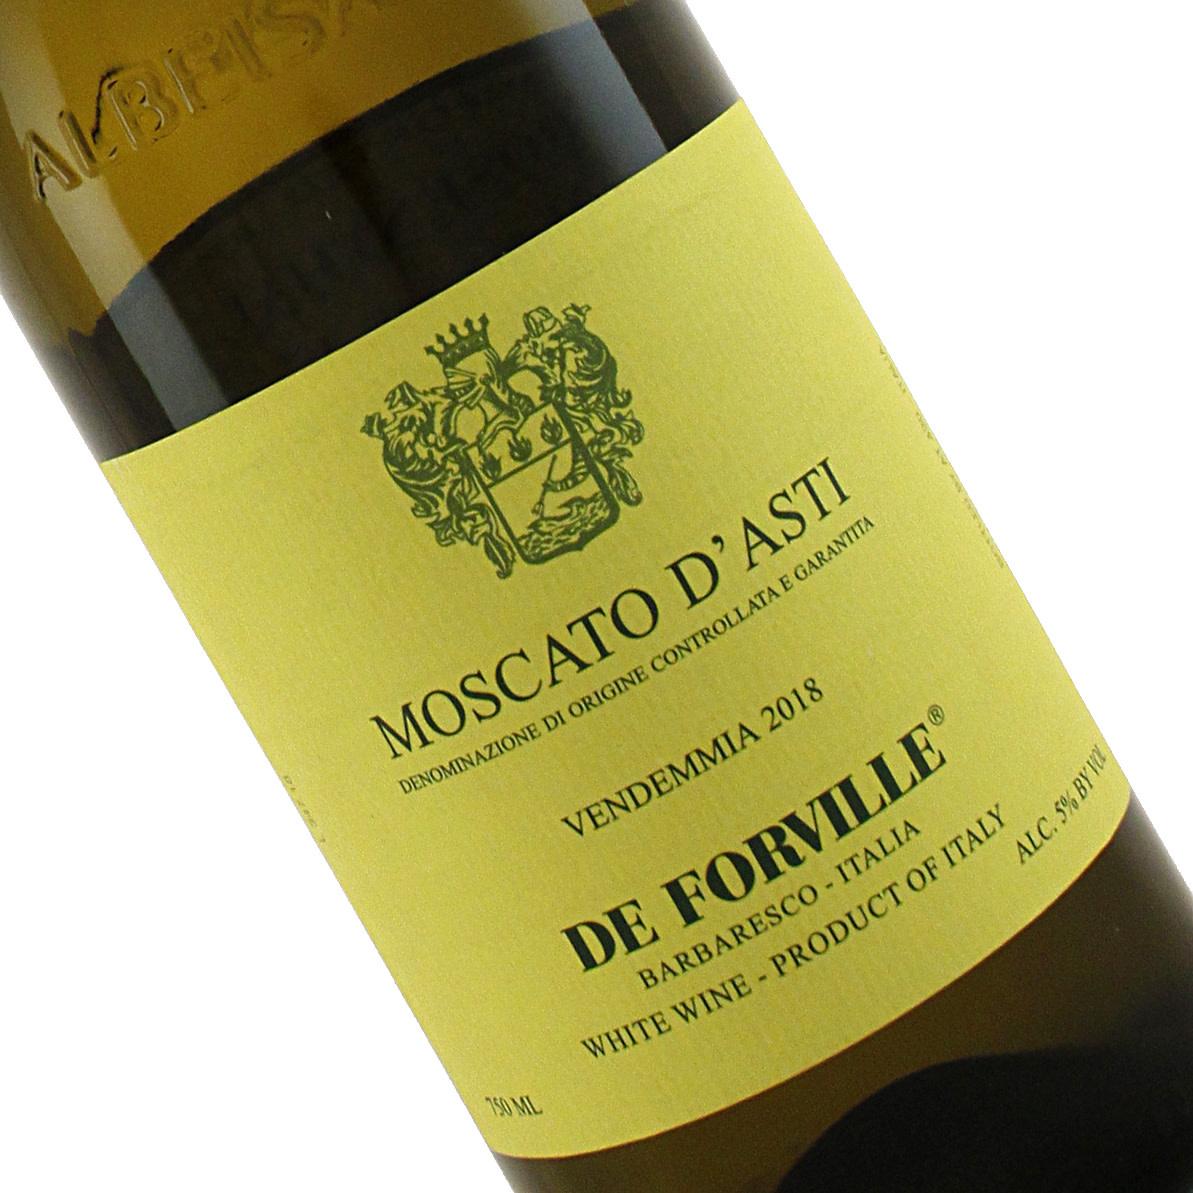 De Forville 2018 Moscato D'Asti, Piedmont